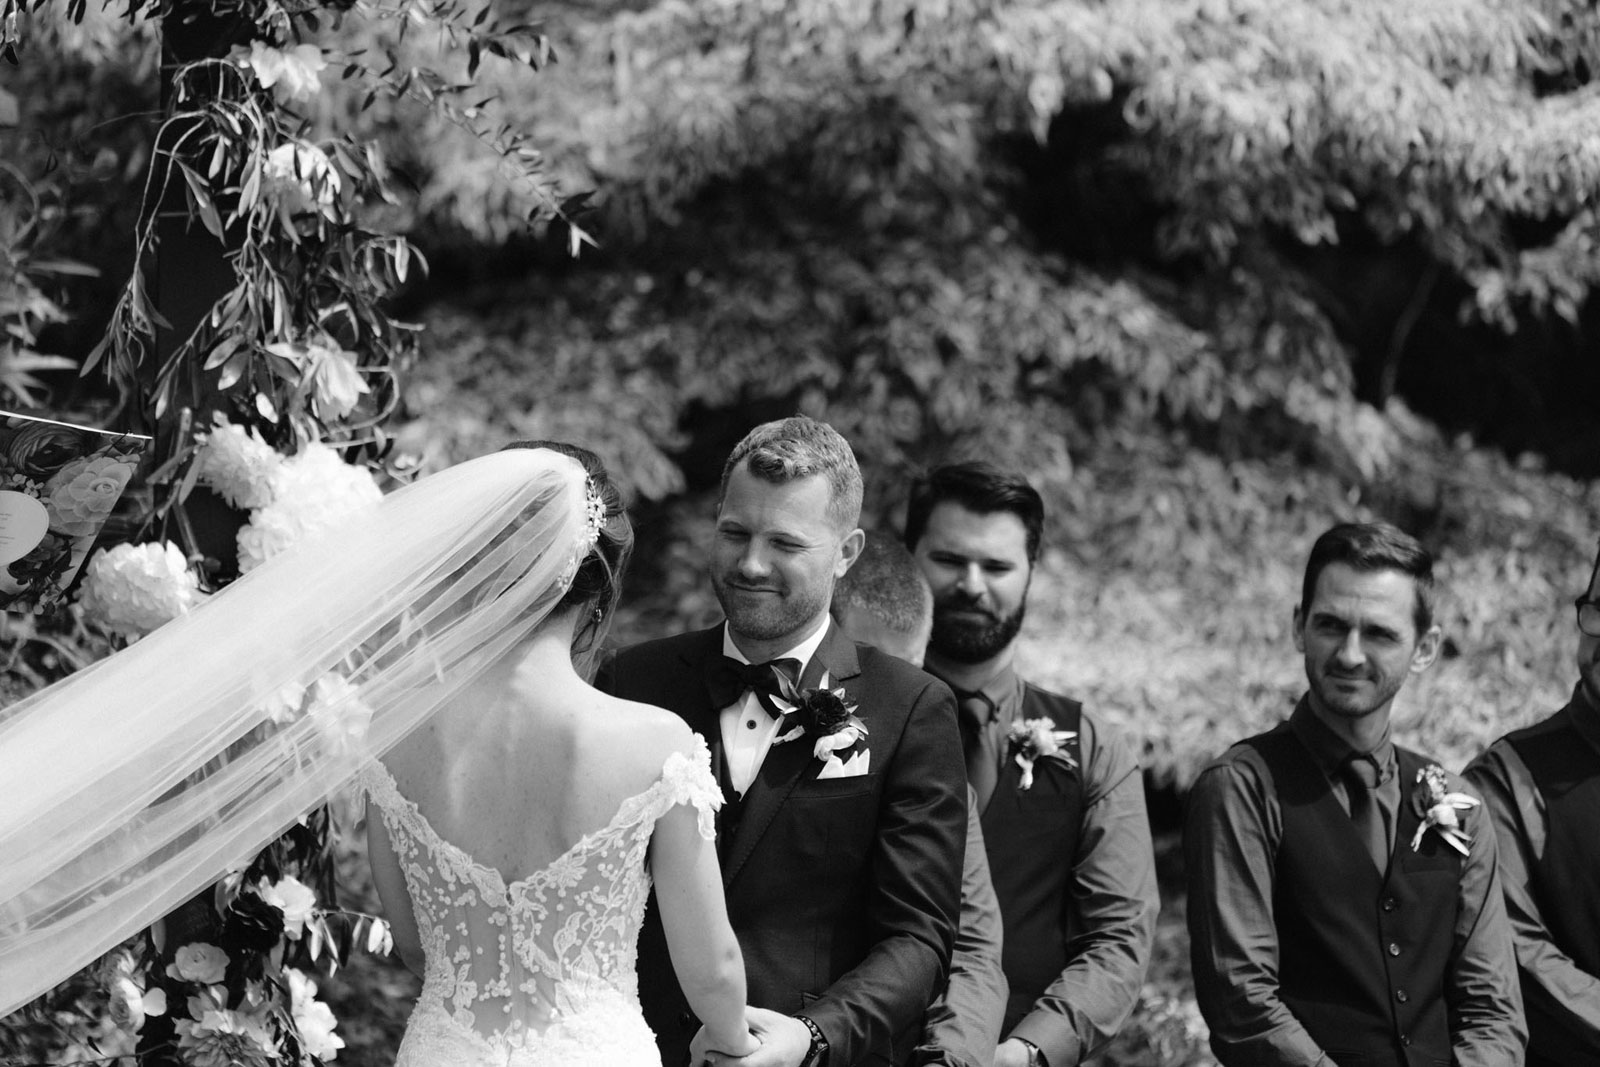 newfound-n-c-olive-tree-cottage-tauranga-wedding-photographer-424